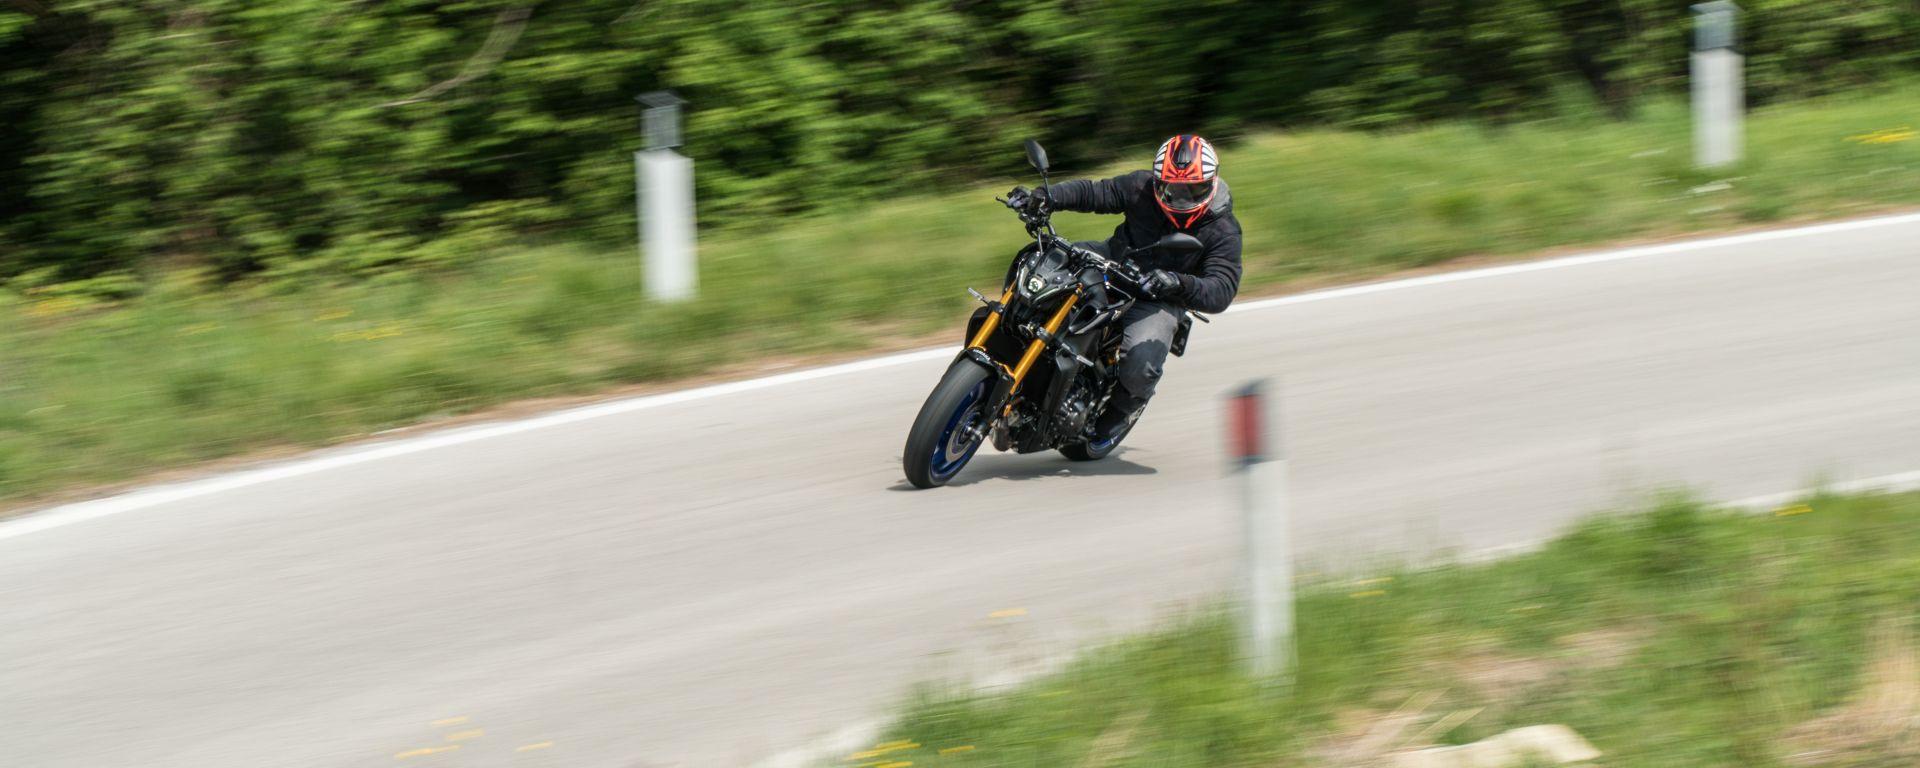 Yamaha MT-09 SP 2021: la prova